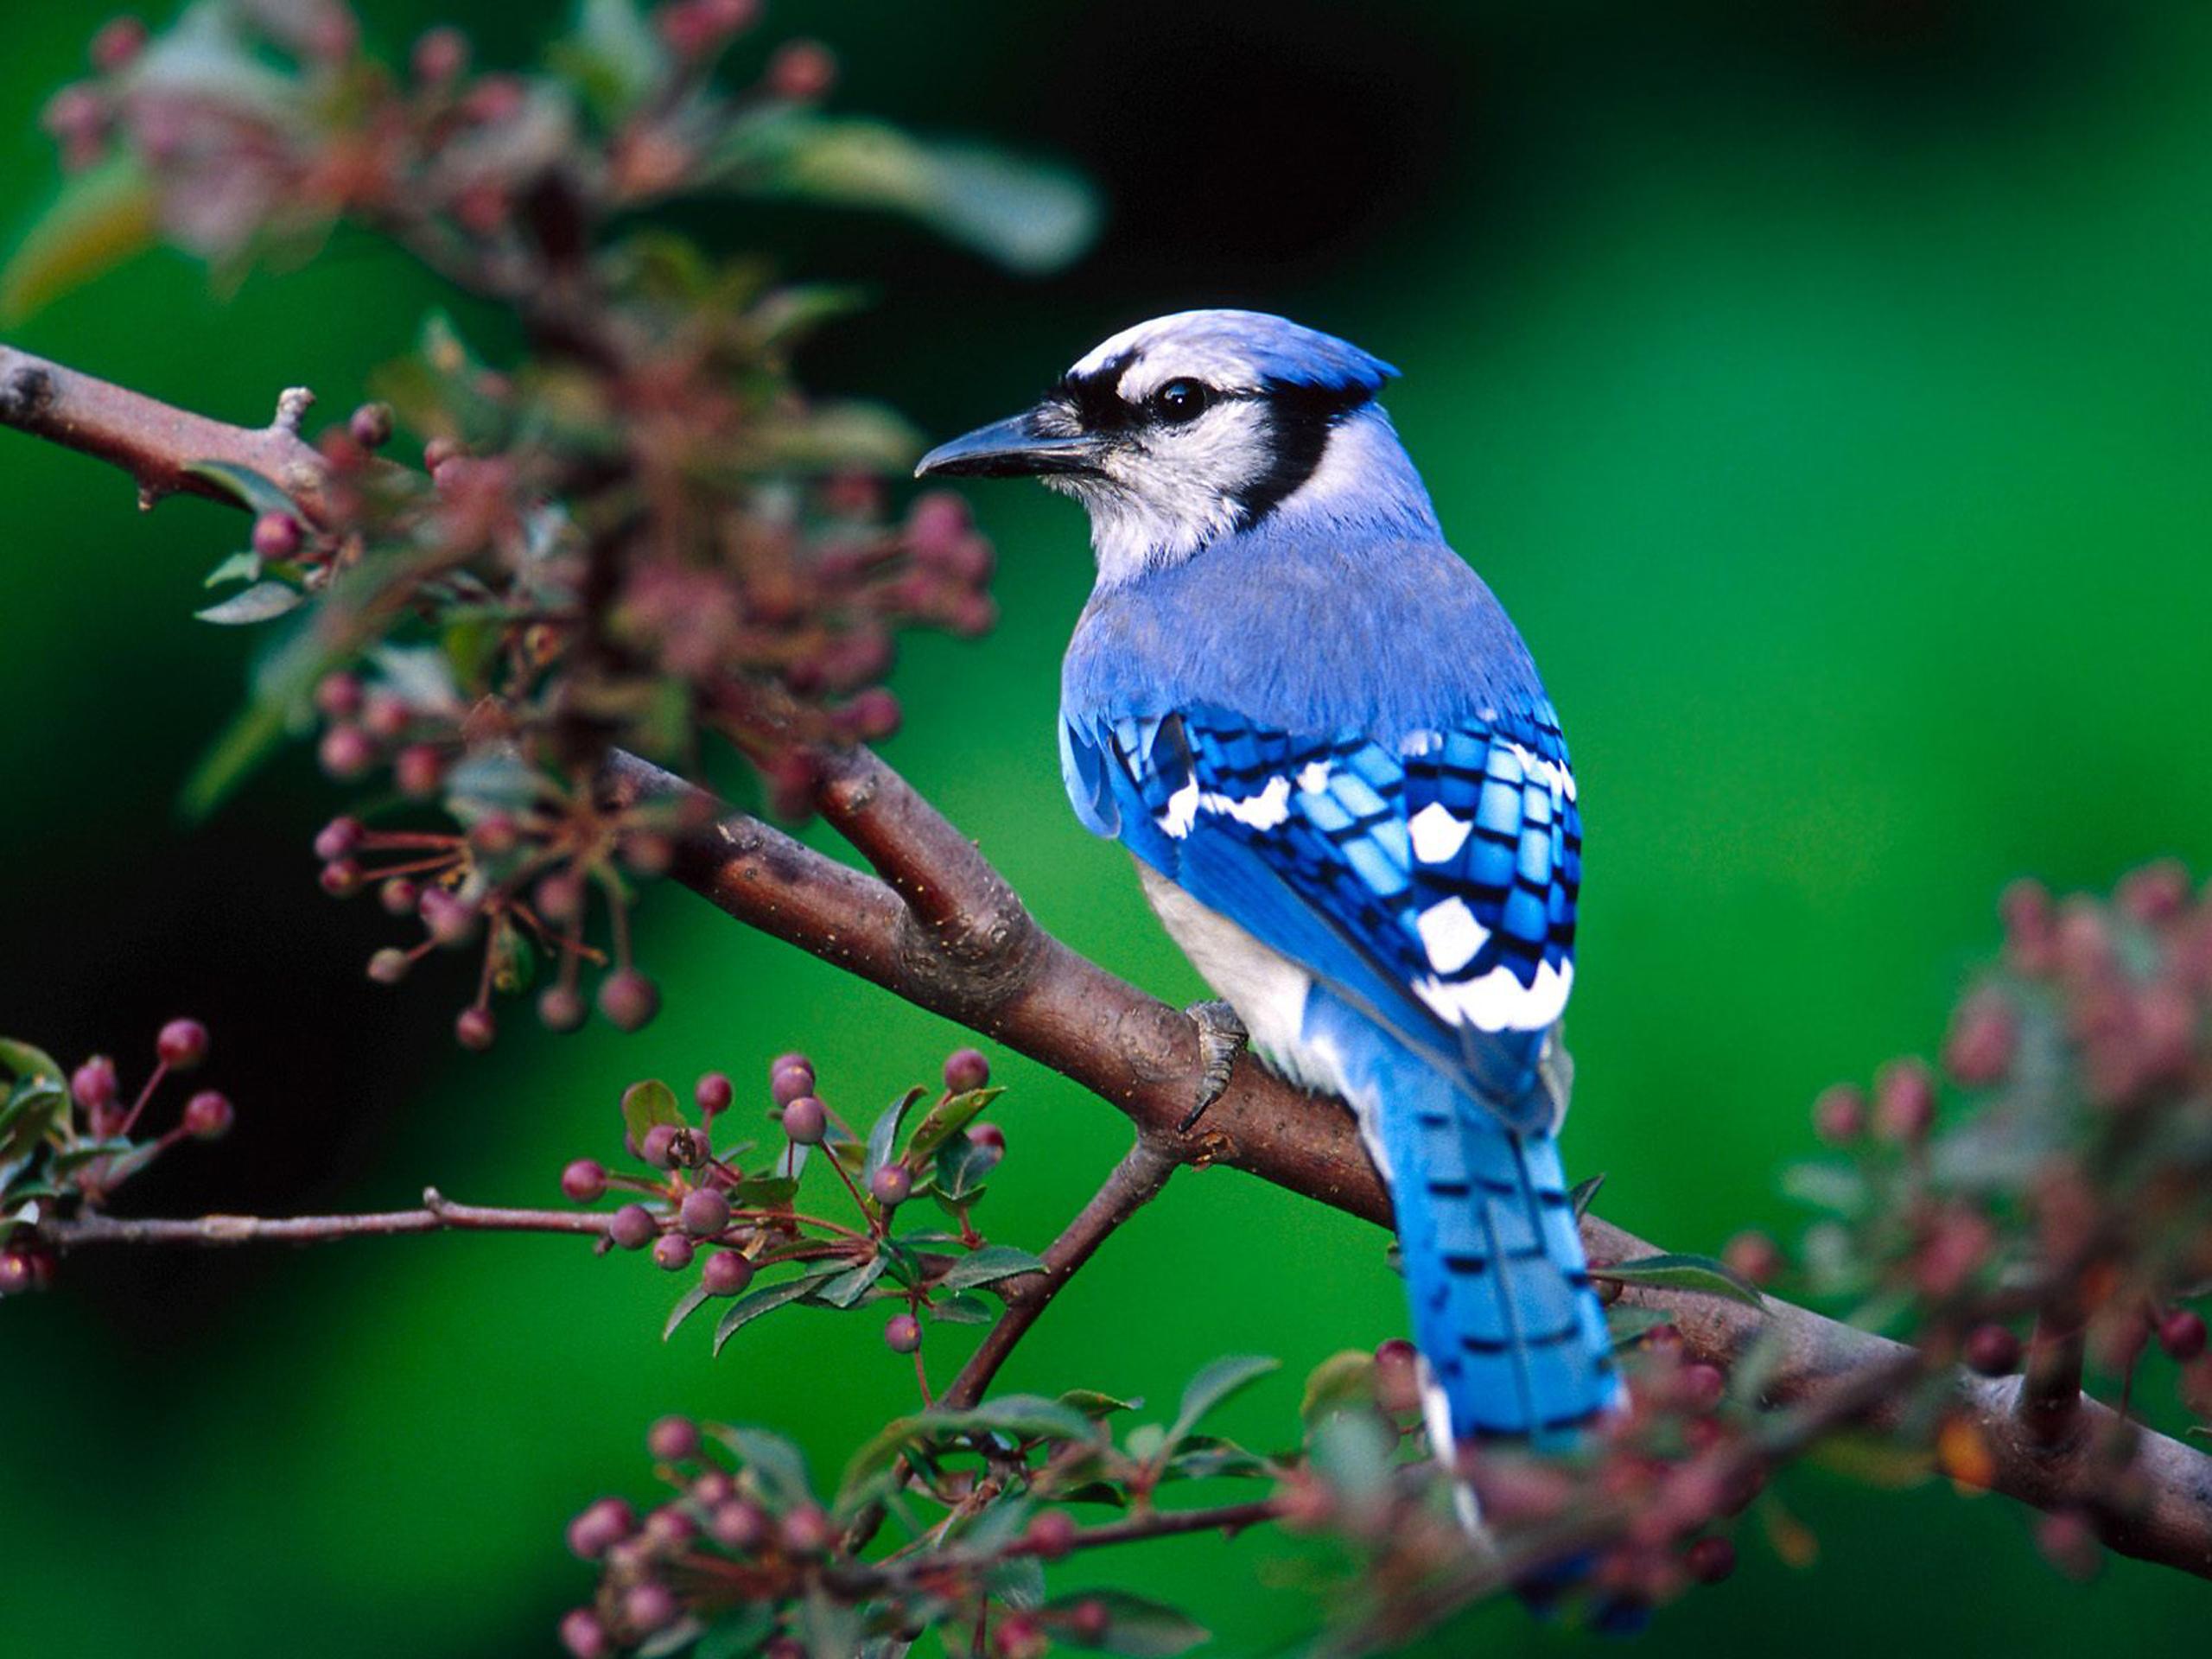 Hình nền Chim 14coloredbeautifulbird